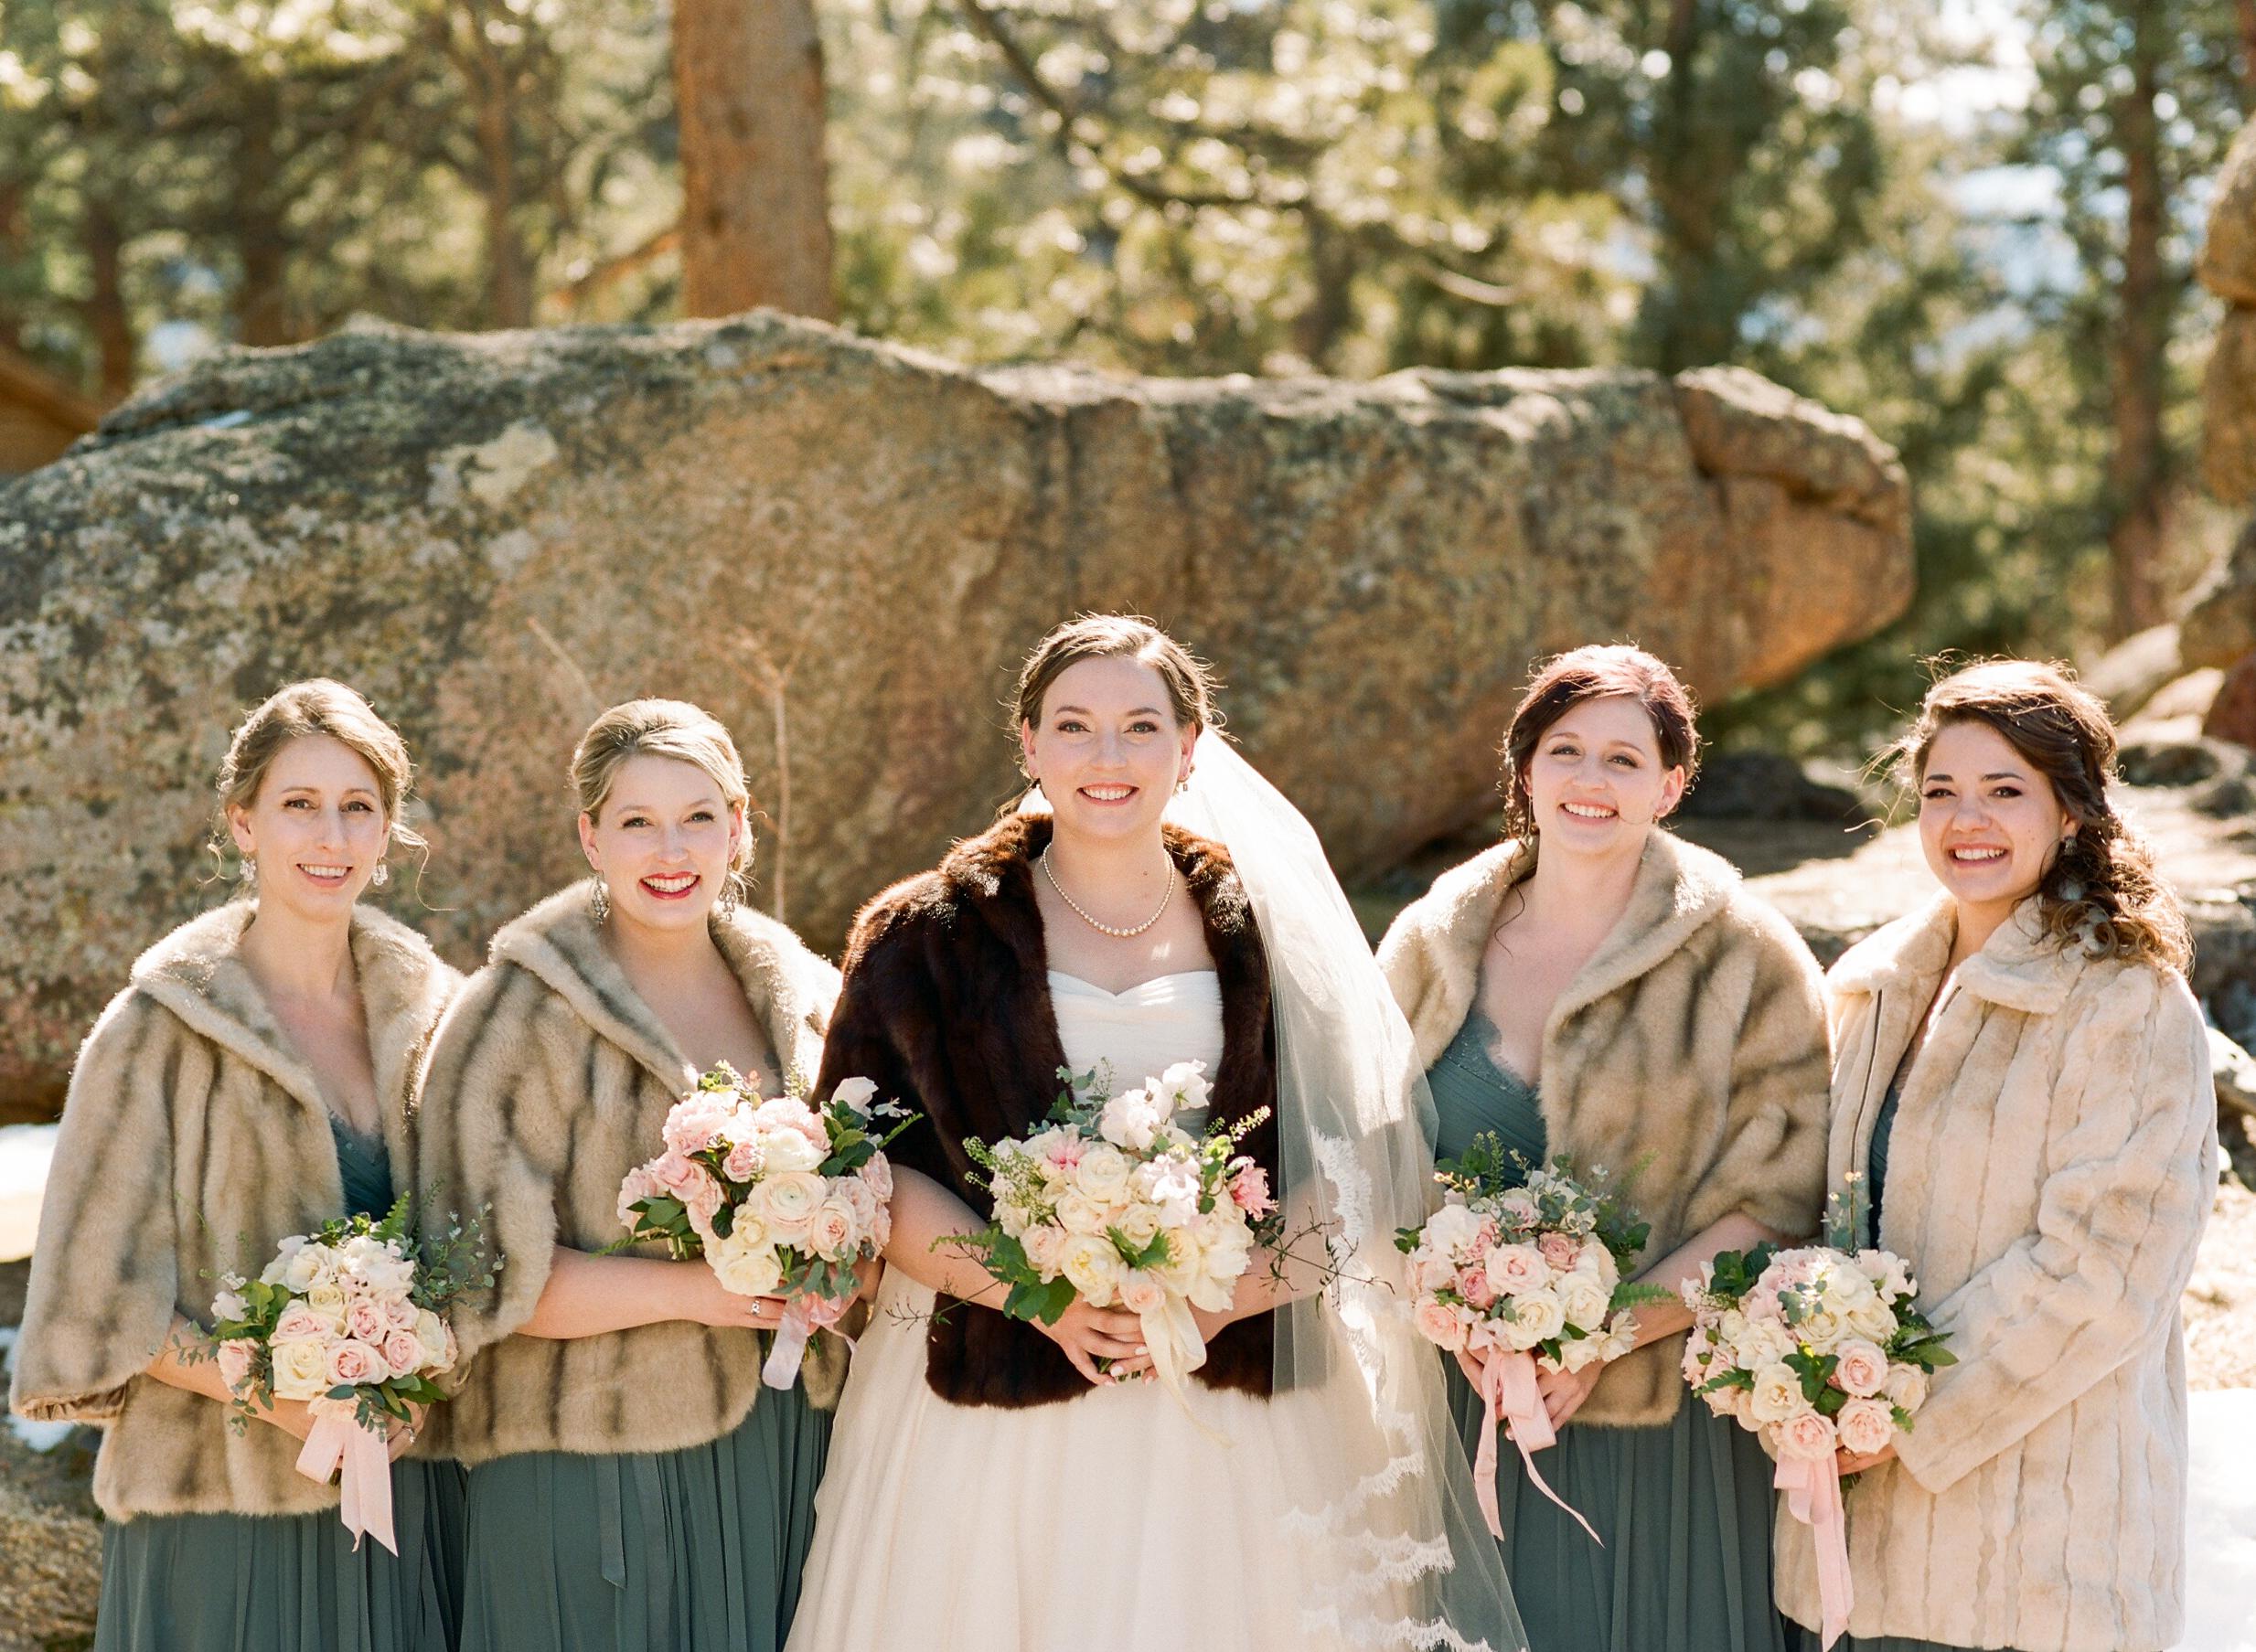 Twin_Owls_Steakhouse-wedding_photographer_Estes_Park_Lisa_ODwyer-226.jpg